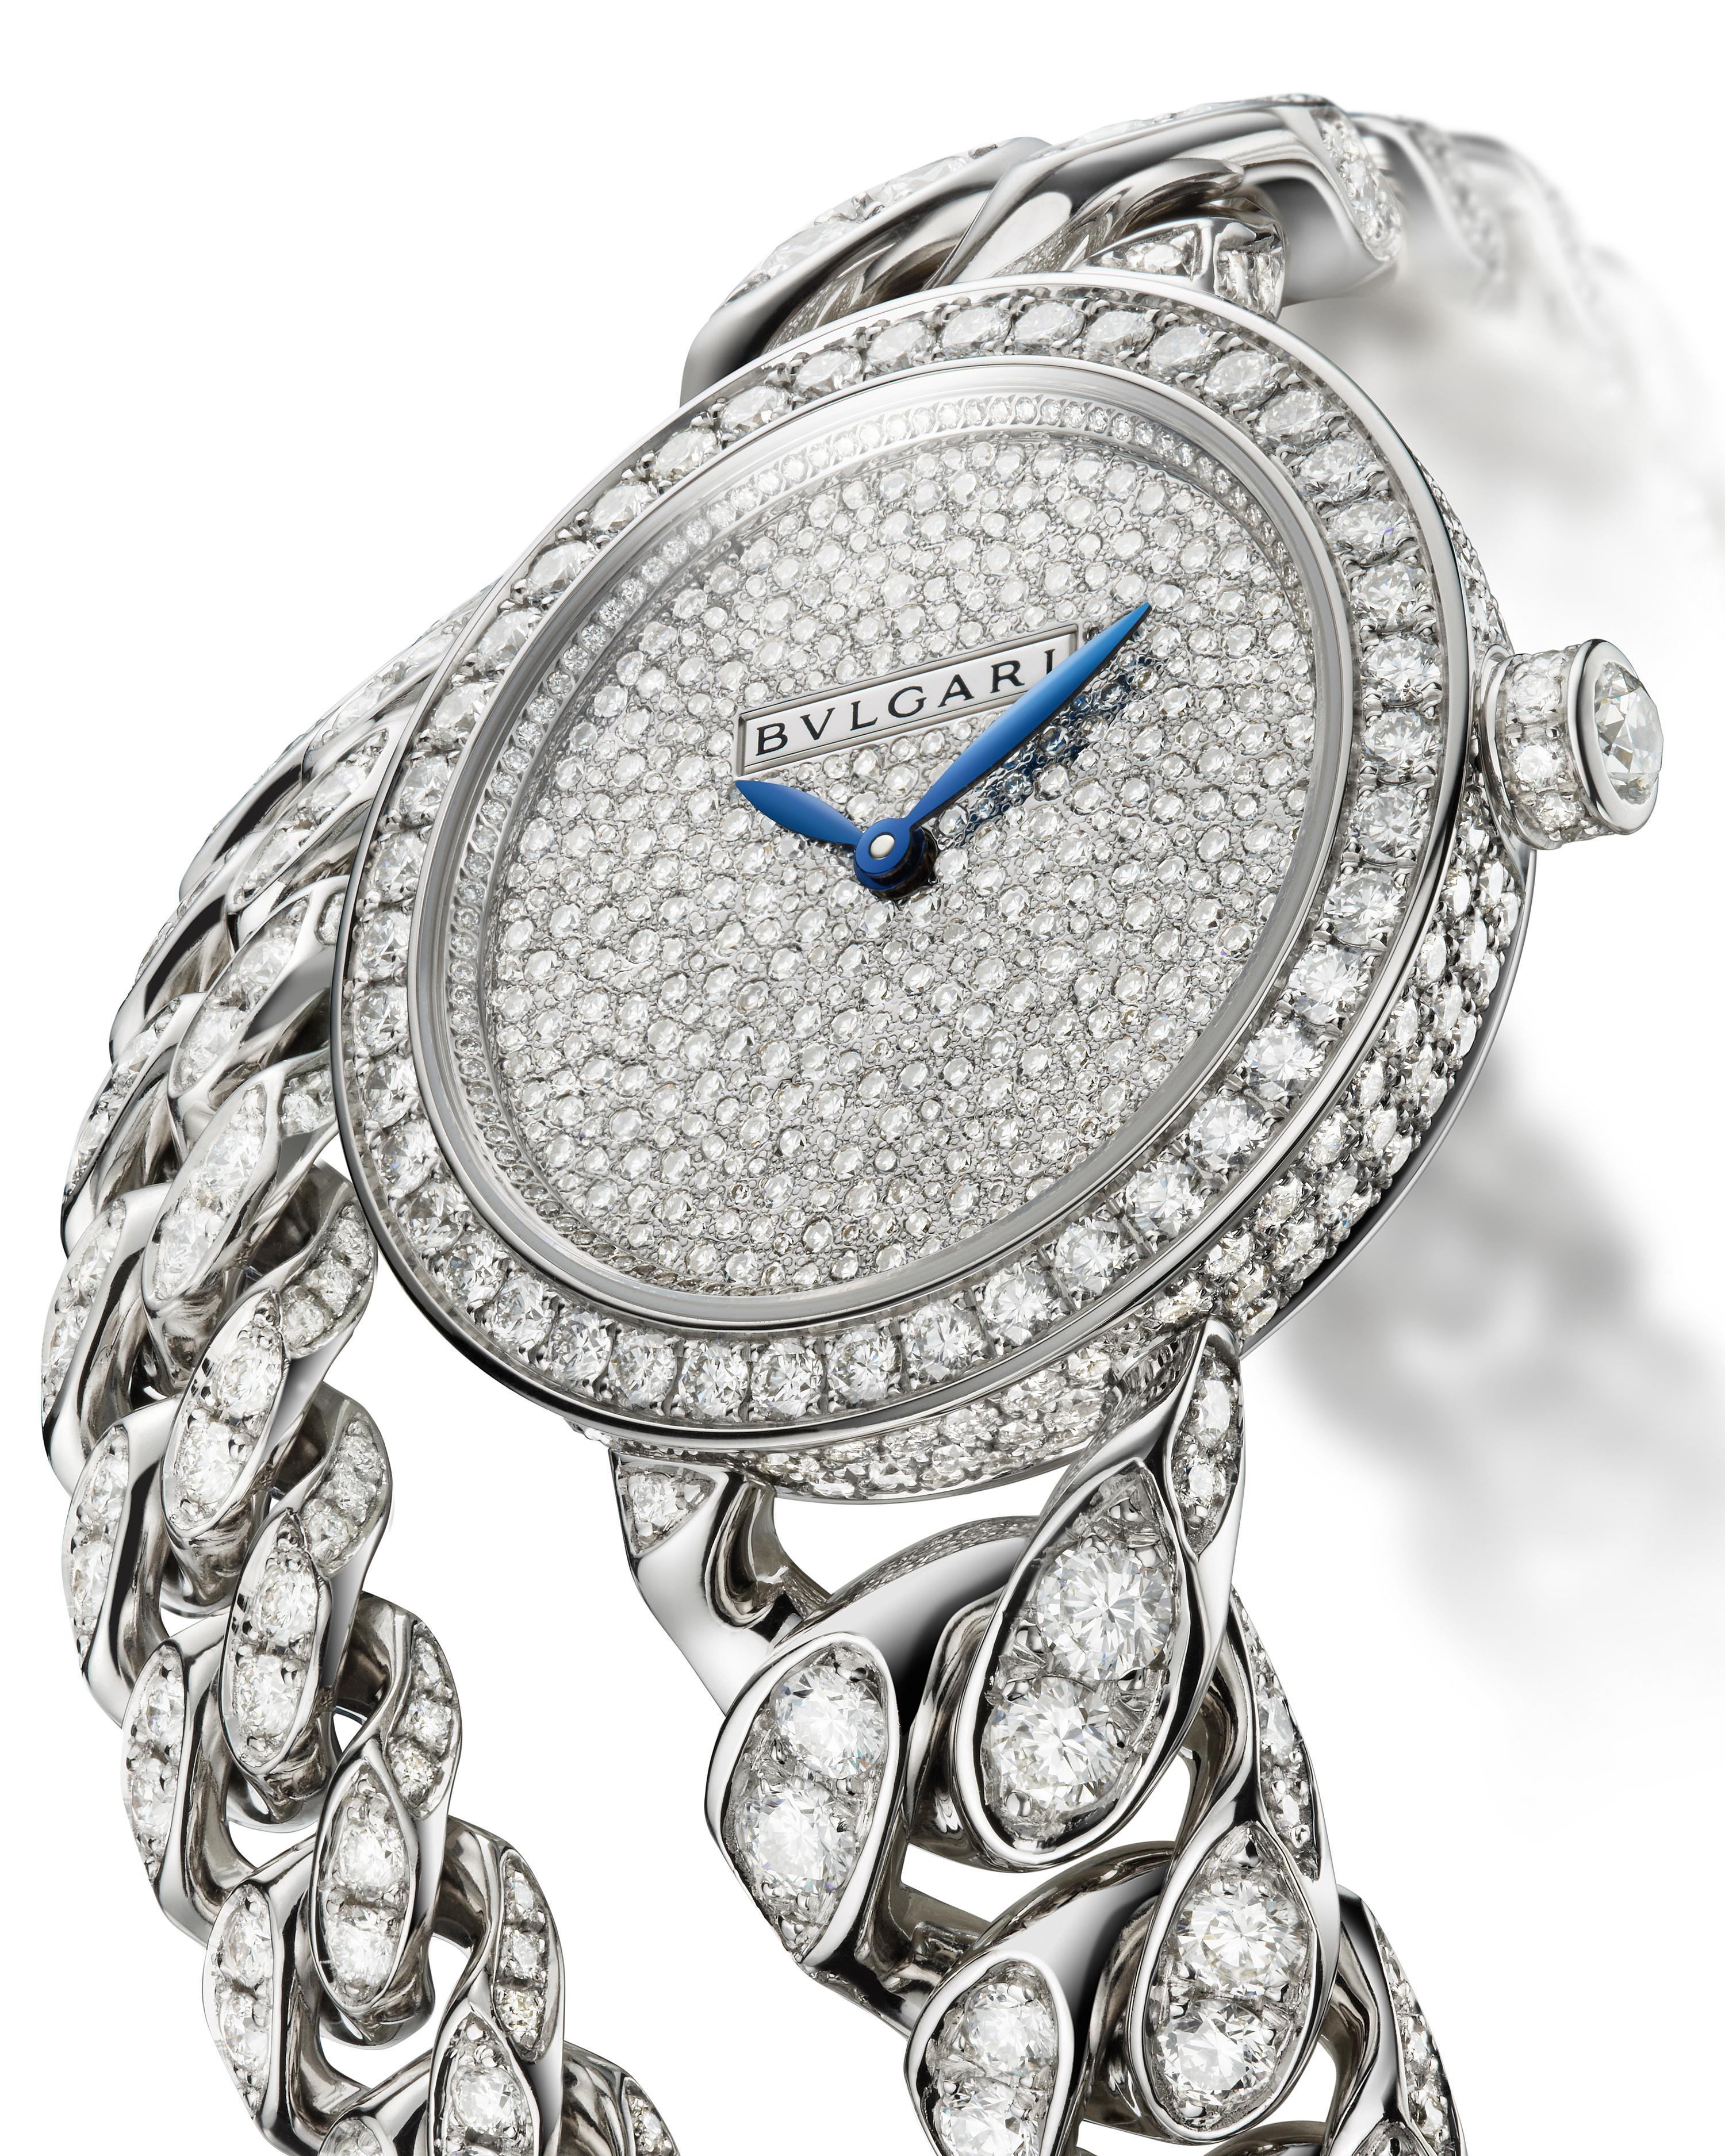 sparkly-accessories-bulgari-1215.jpg